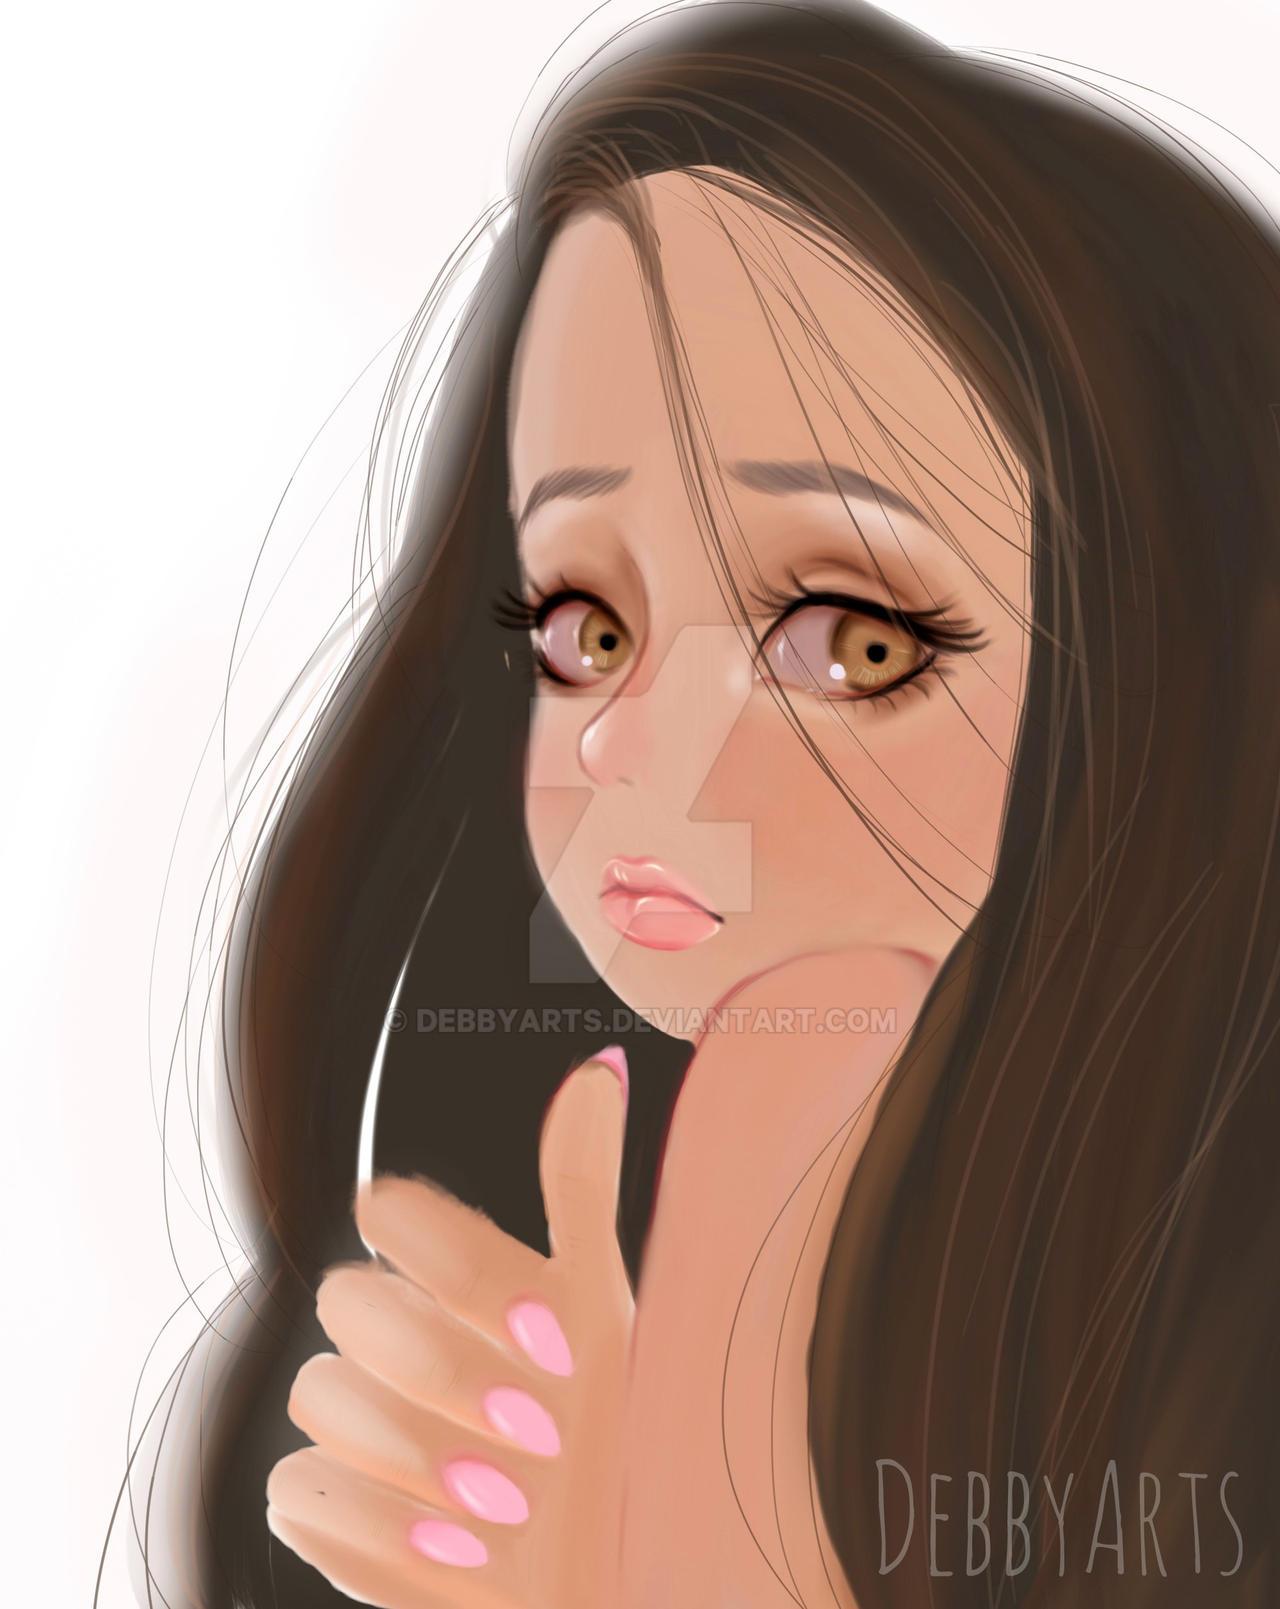 Girl Digital - Realistic Style by DebbyArts